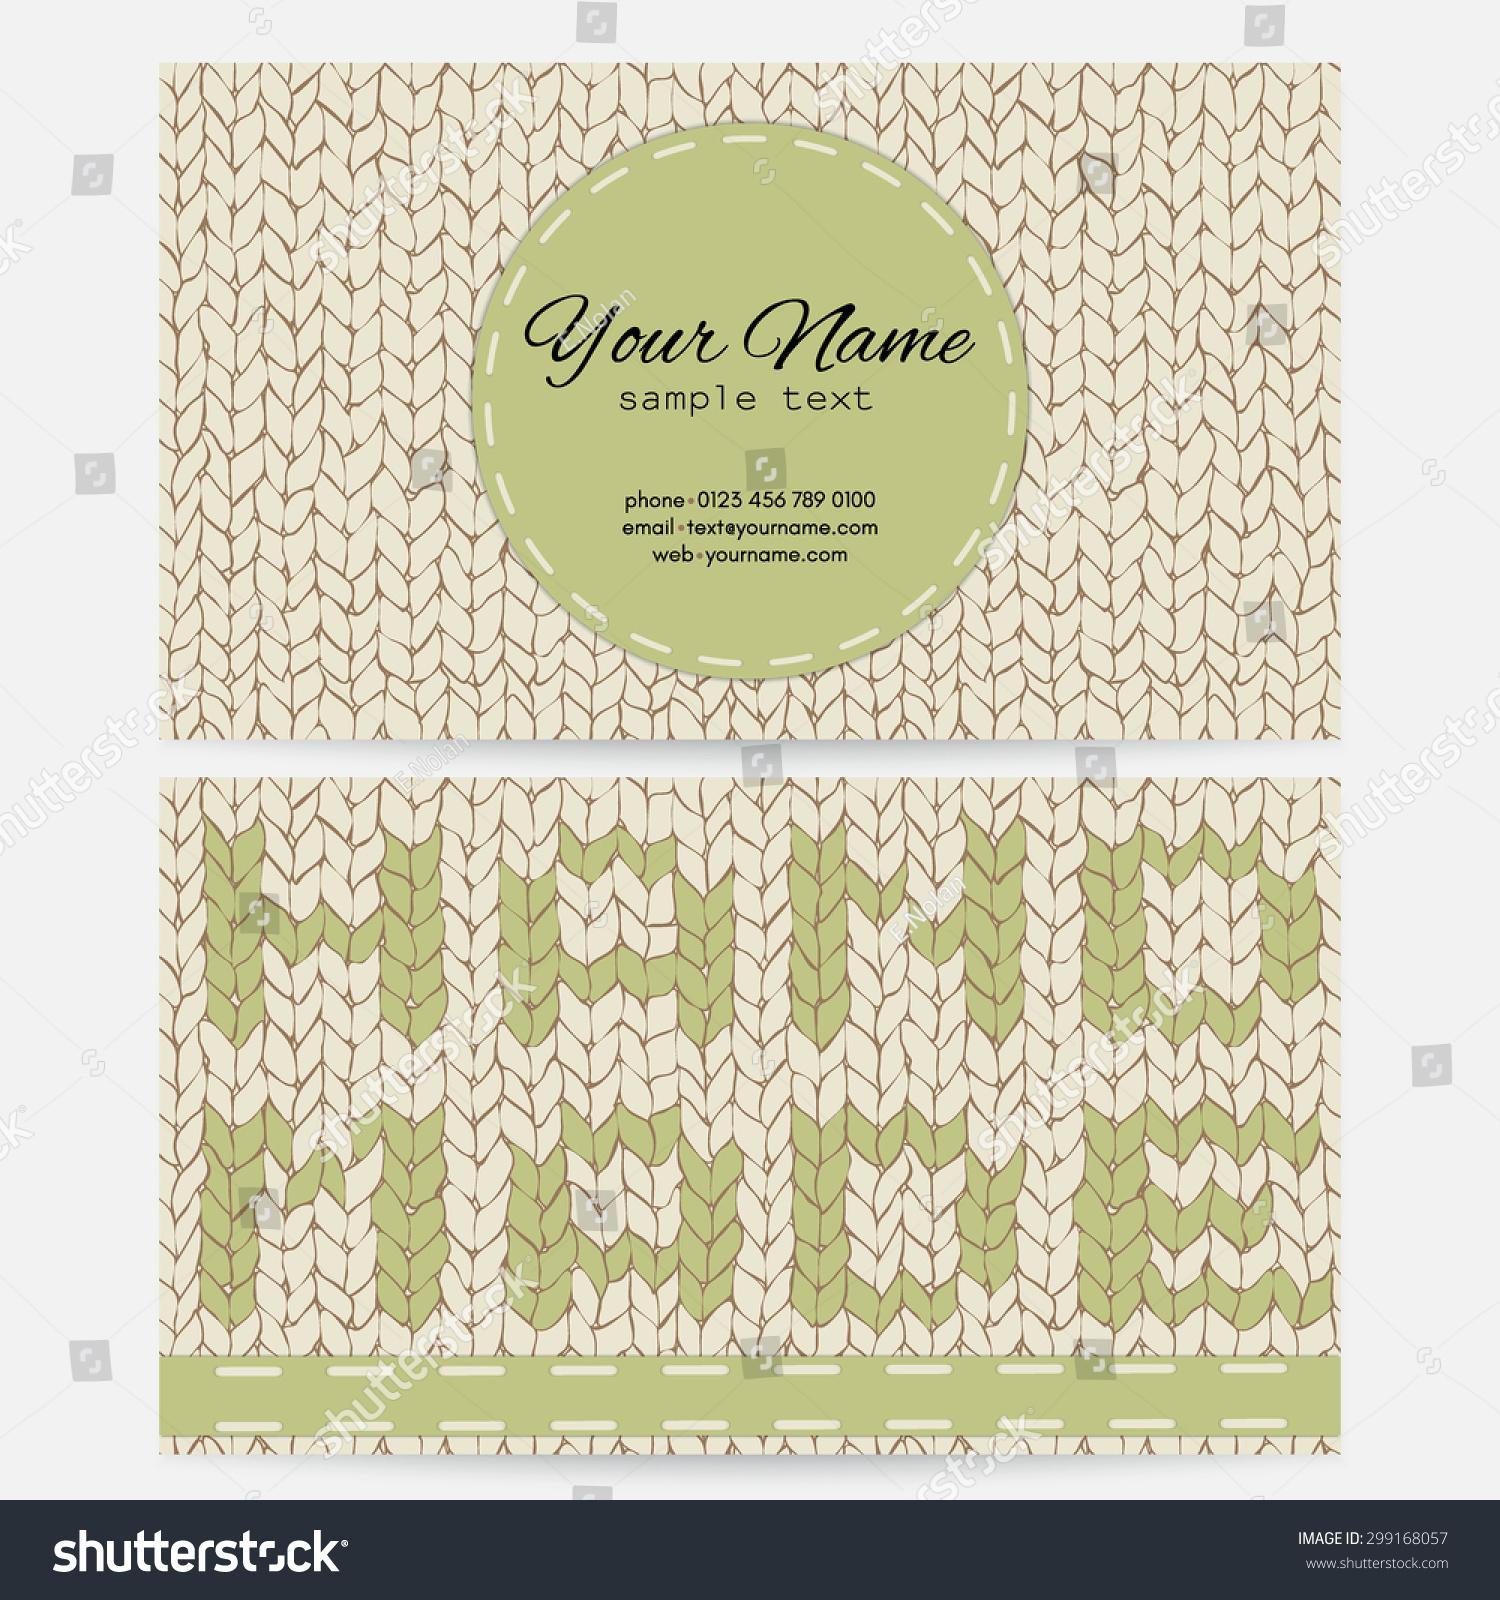 Business card style knitting handmade stock vector 2018 299168057 business card in the style of knitting handmade colourmoves